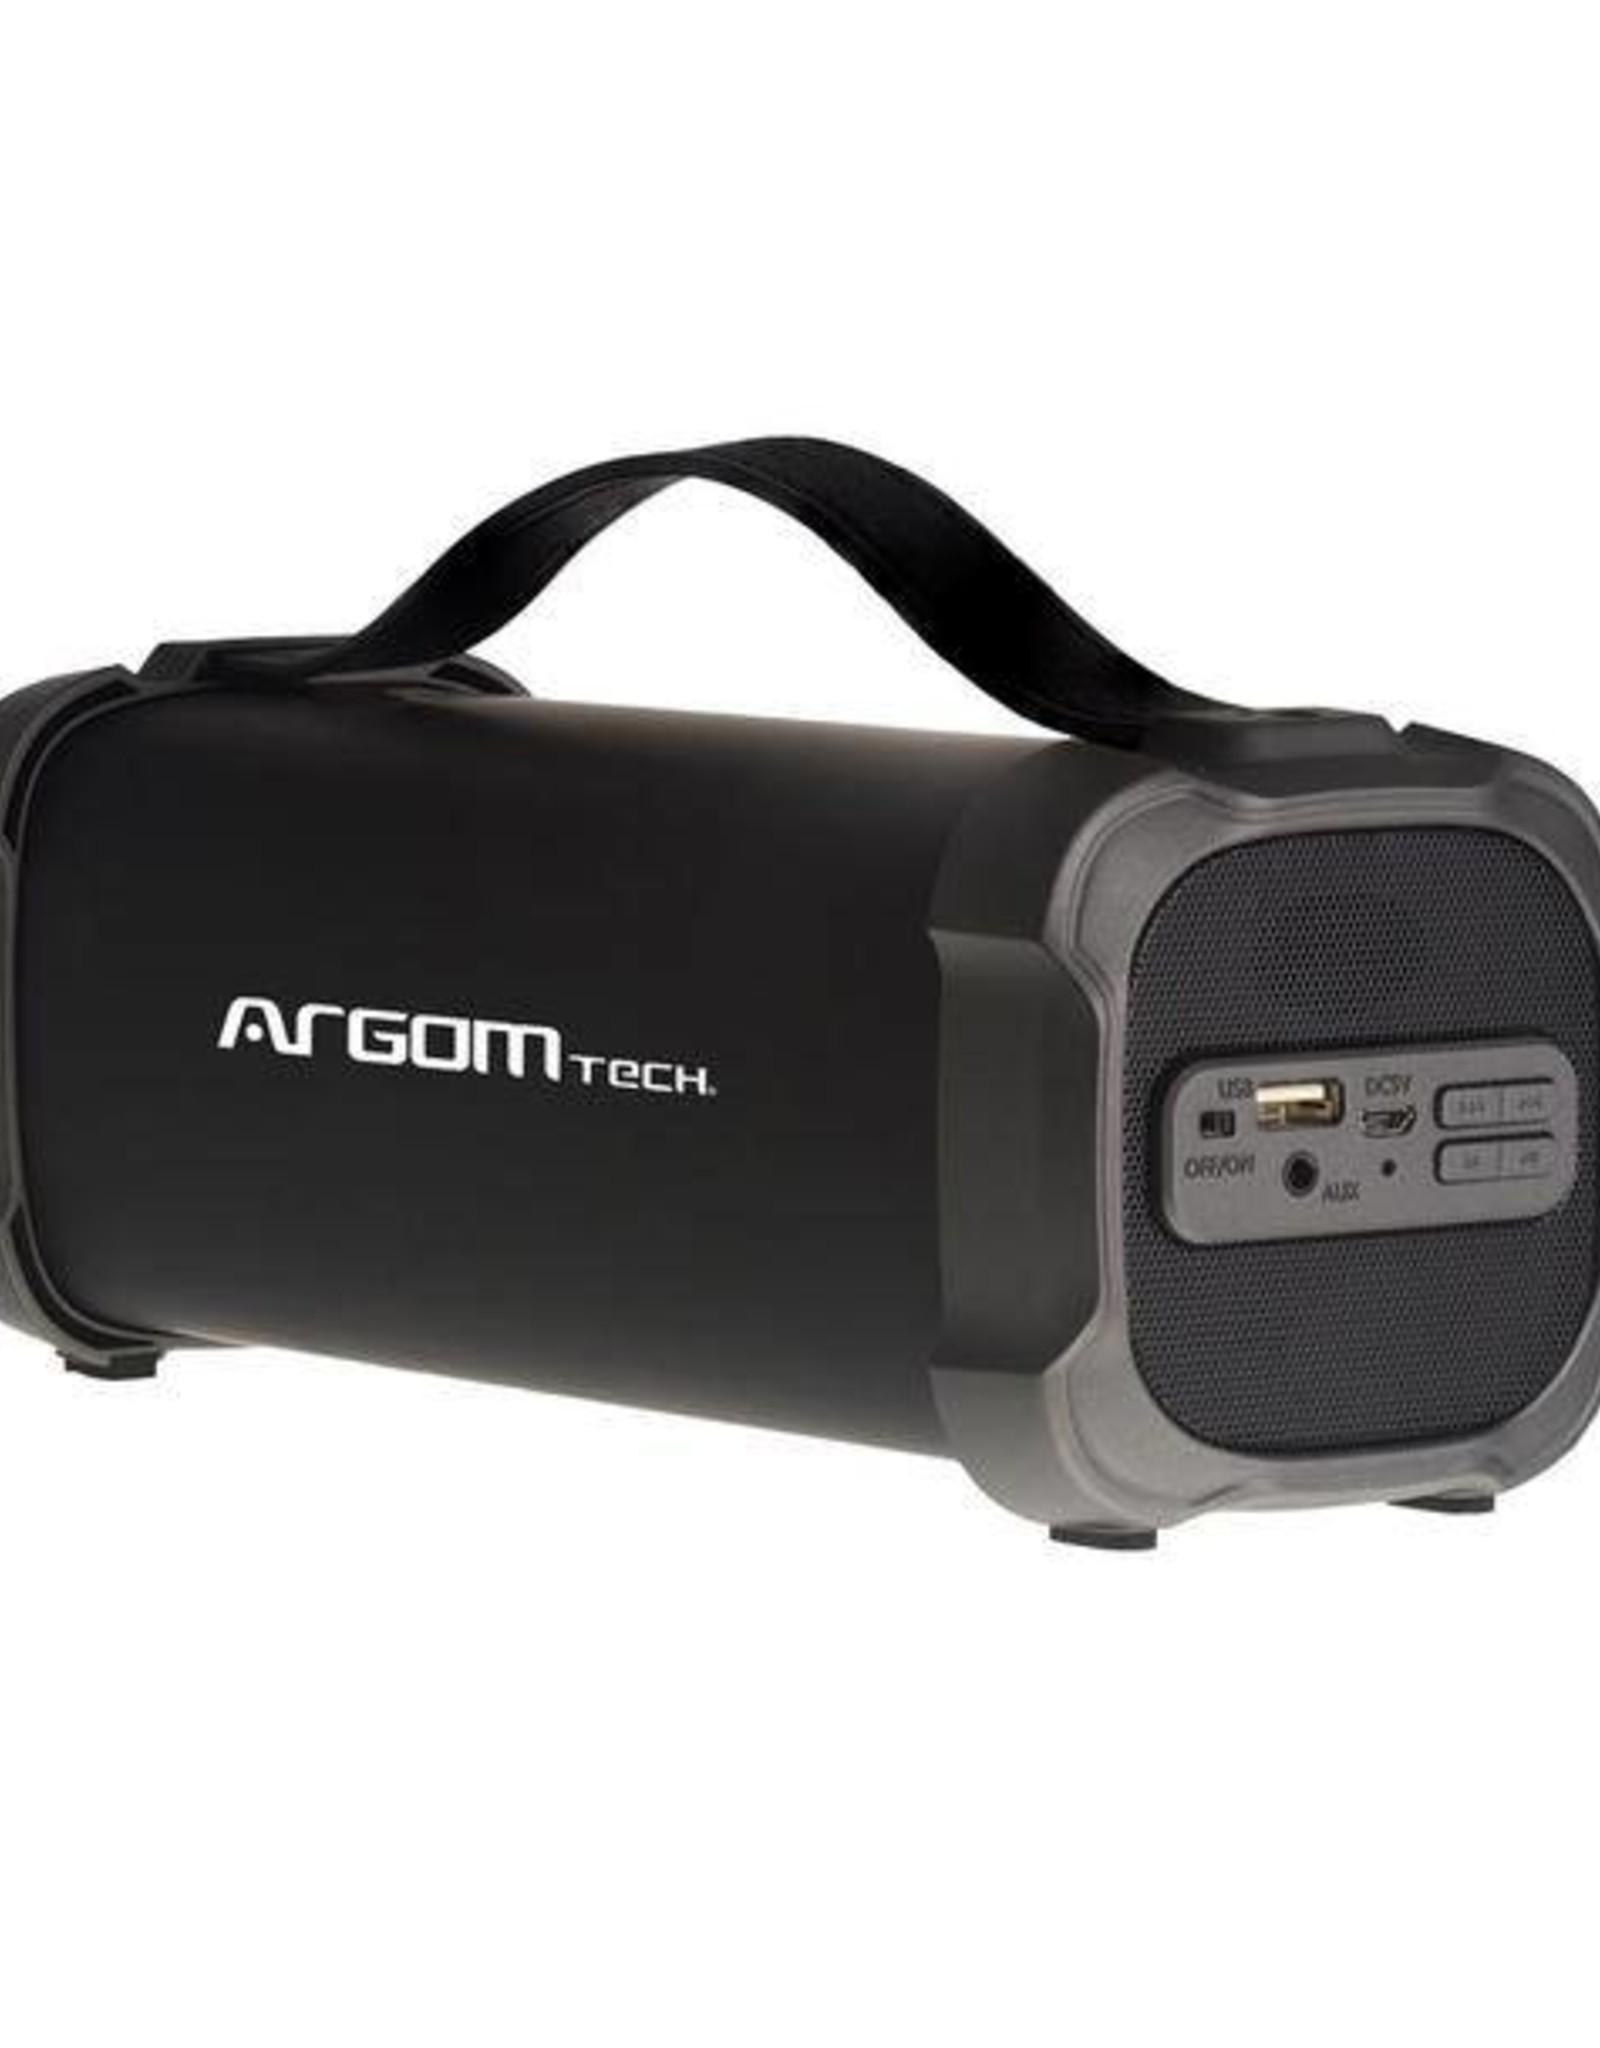 Argom Tech Bluetooth Slambox Metro Beats Argom Speaker